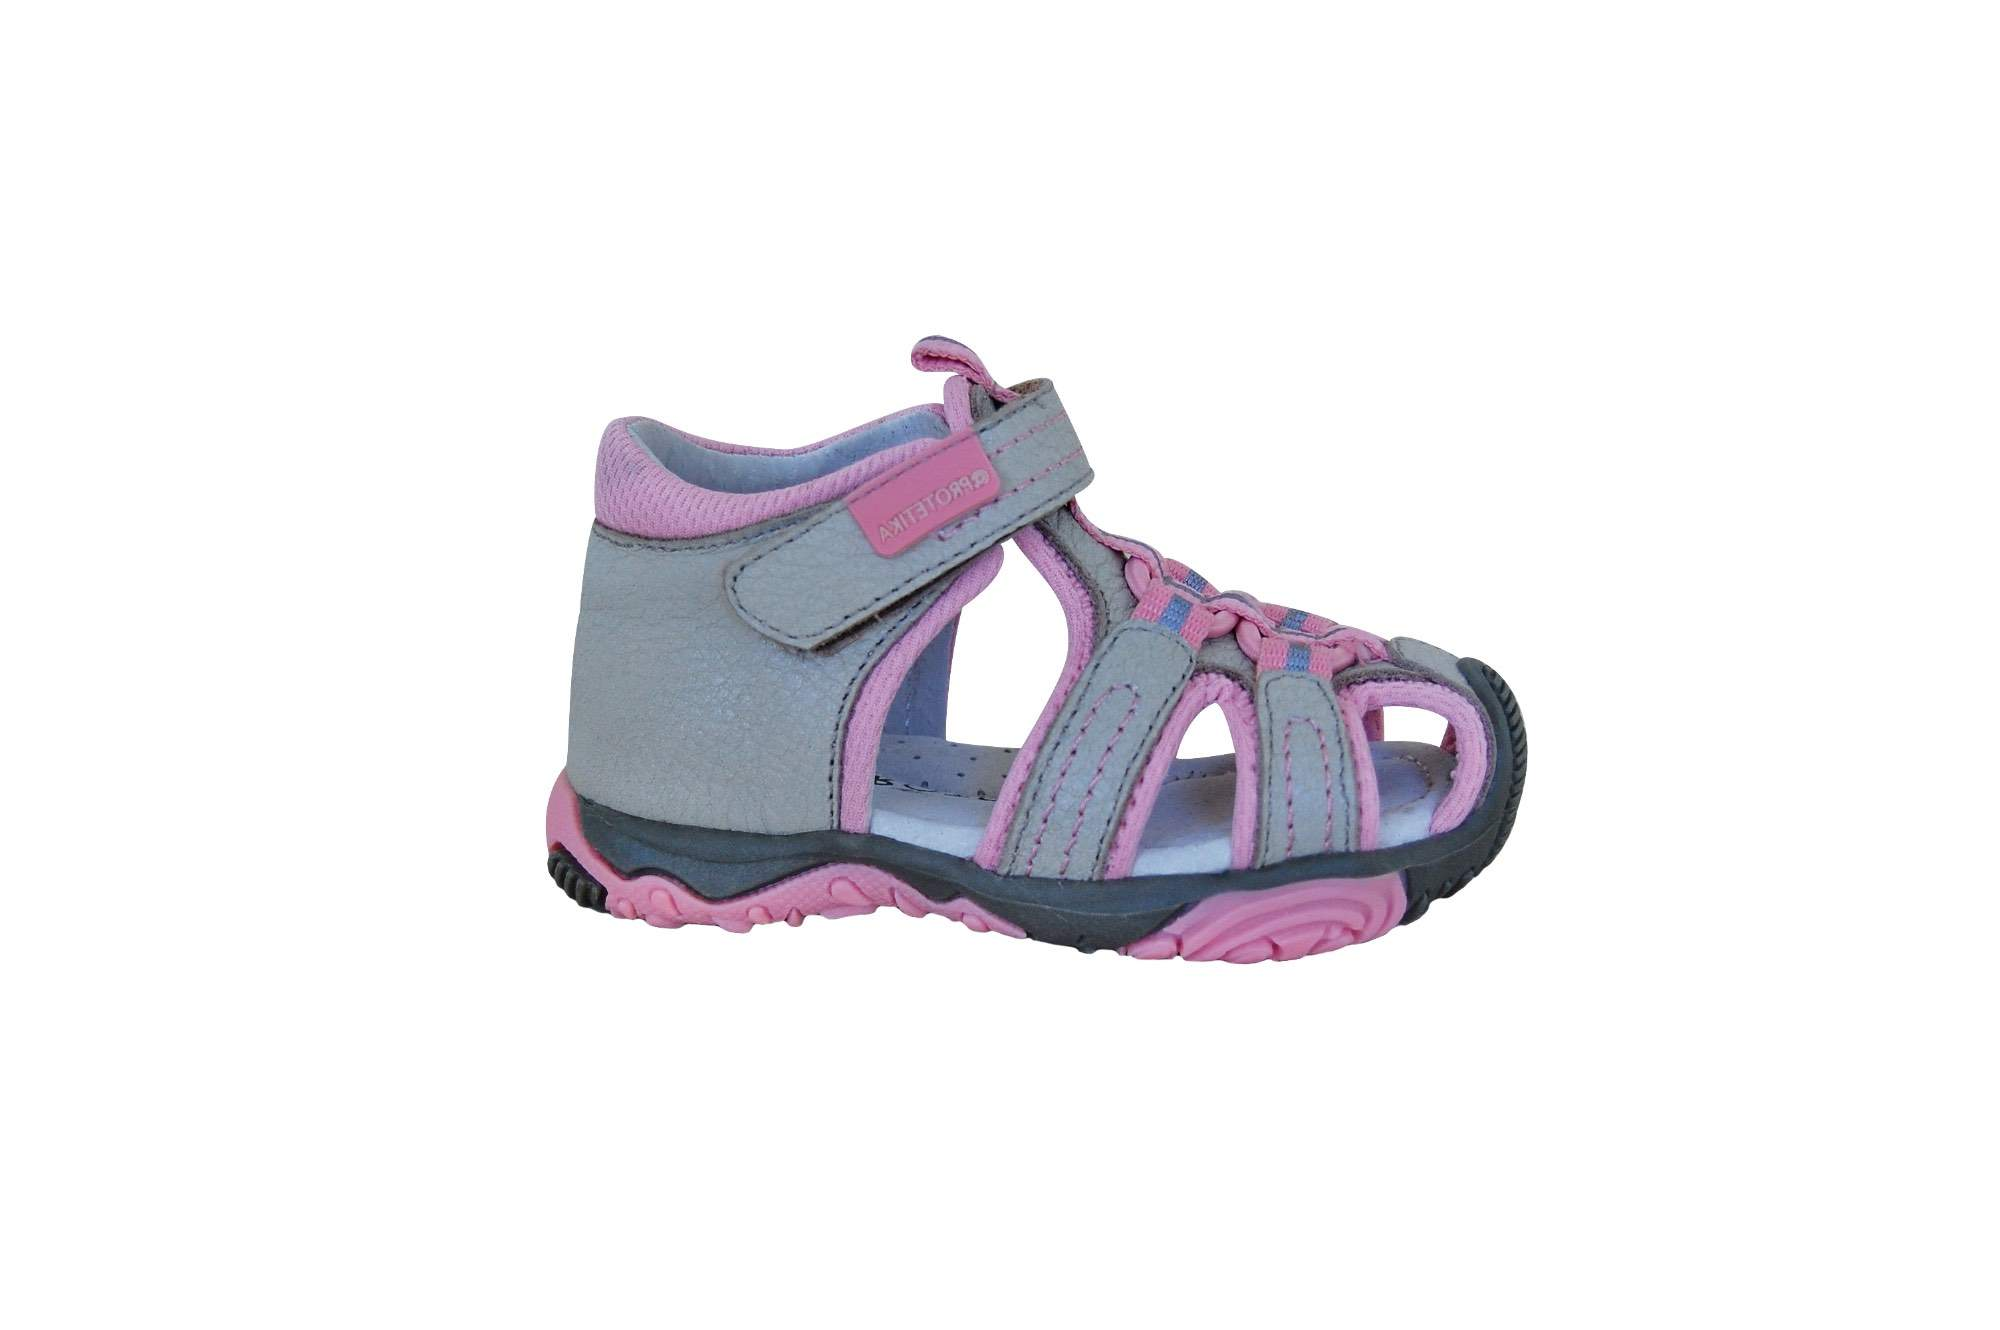 fede7e019aa6 Protetika dětské sandály Sid Beige